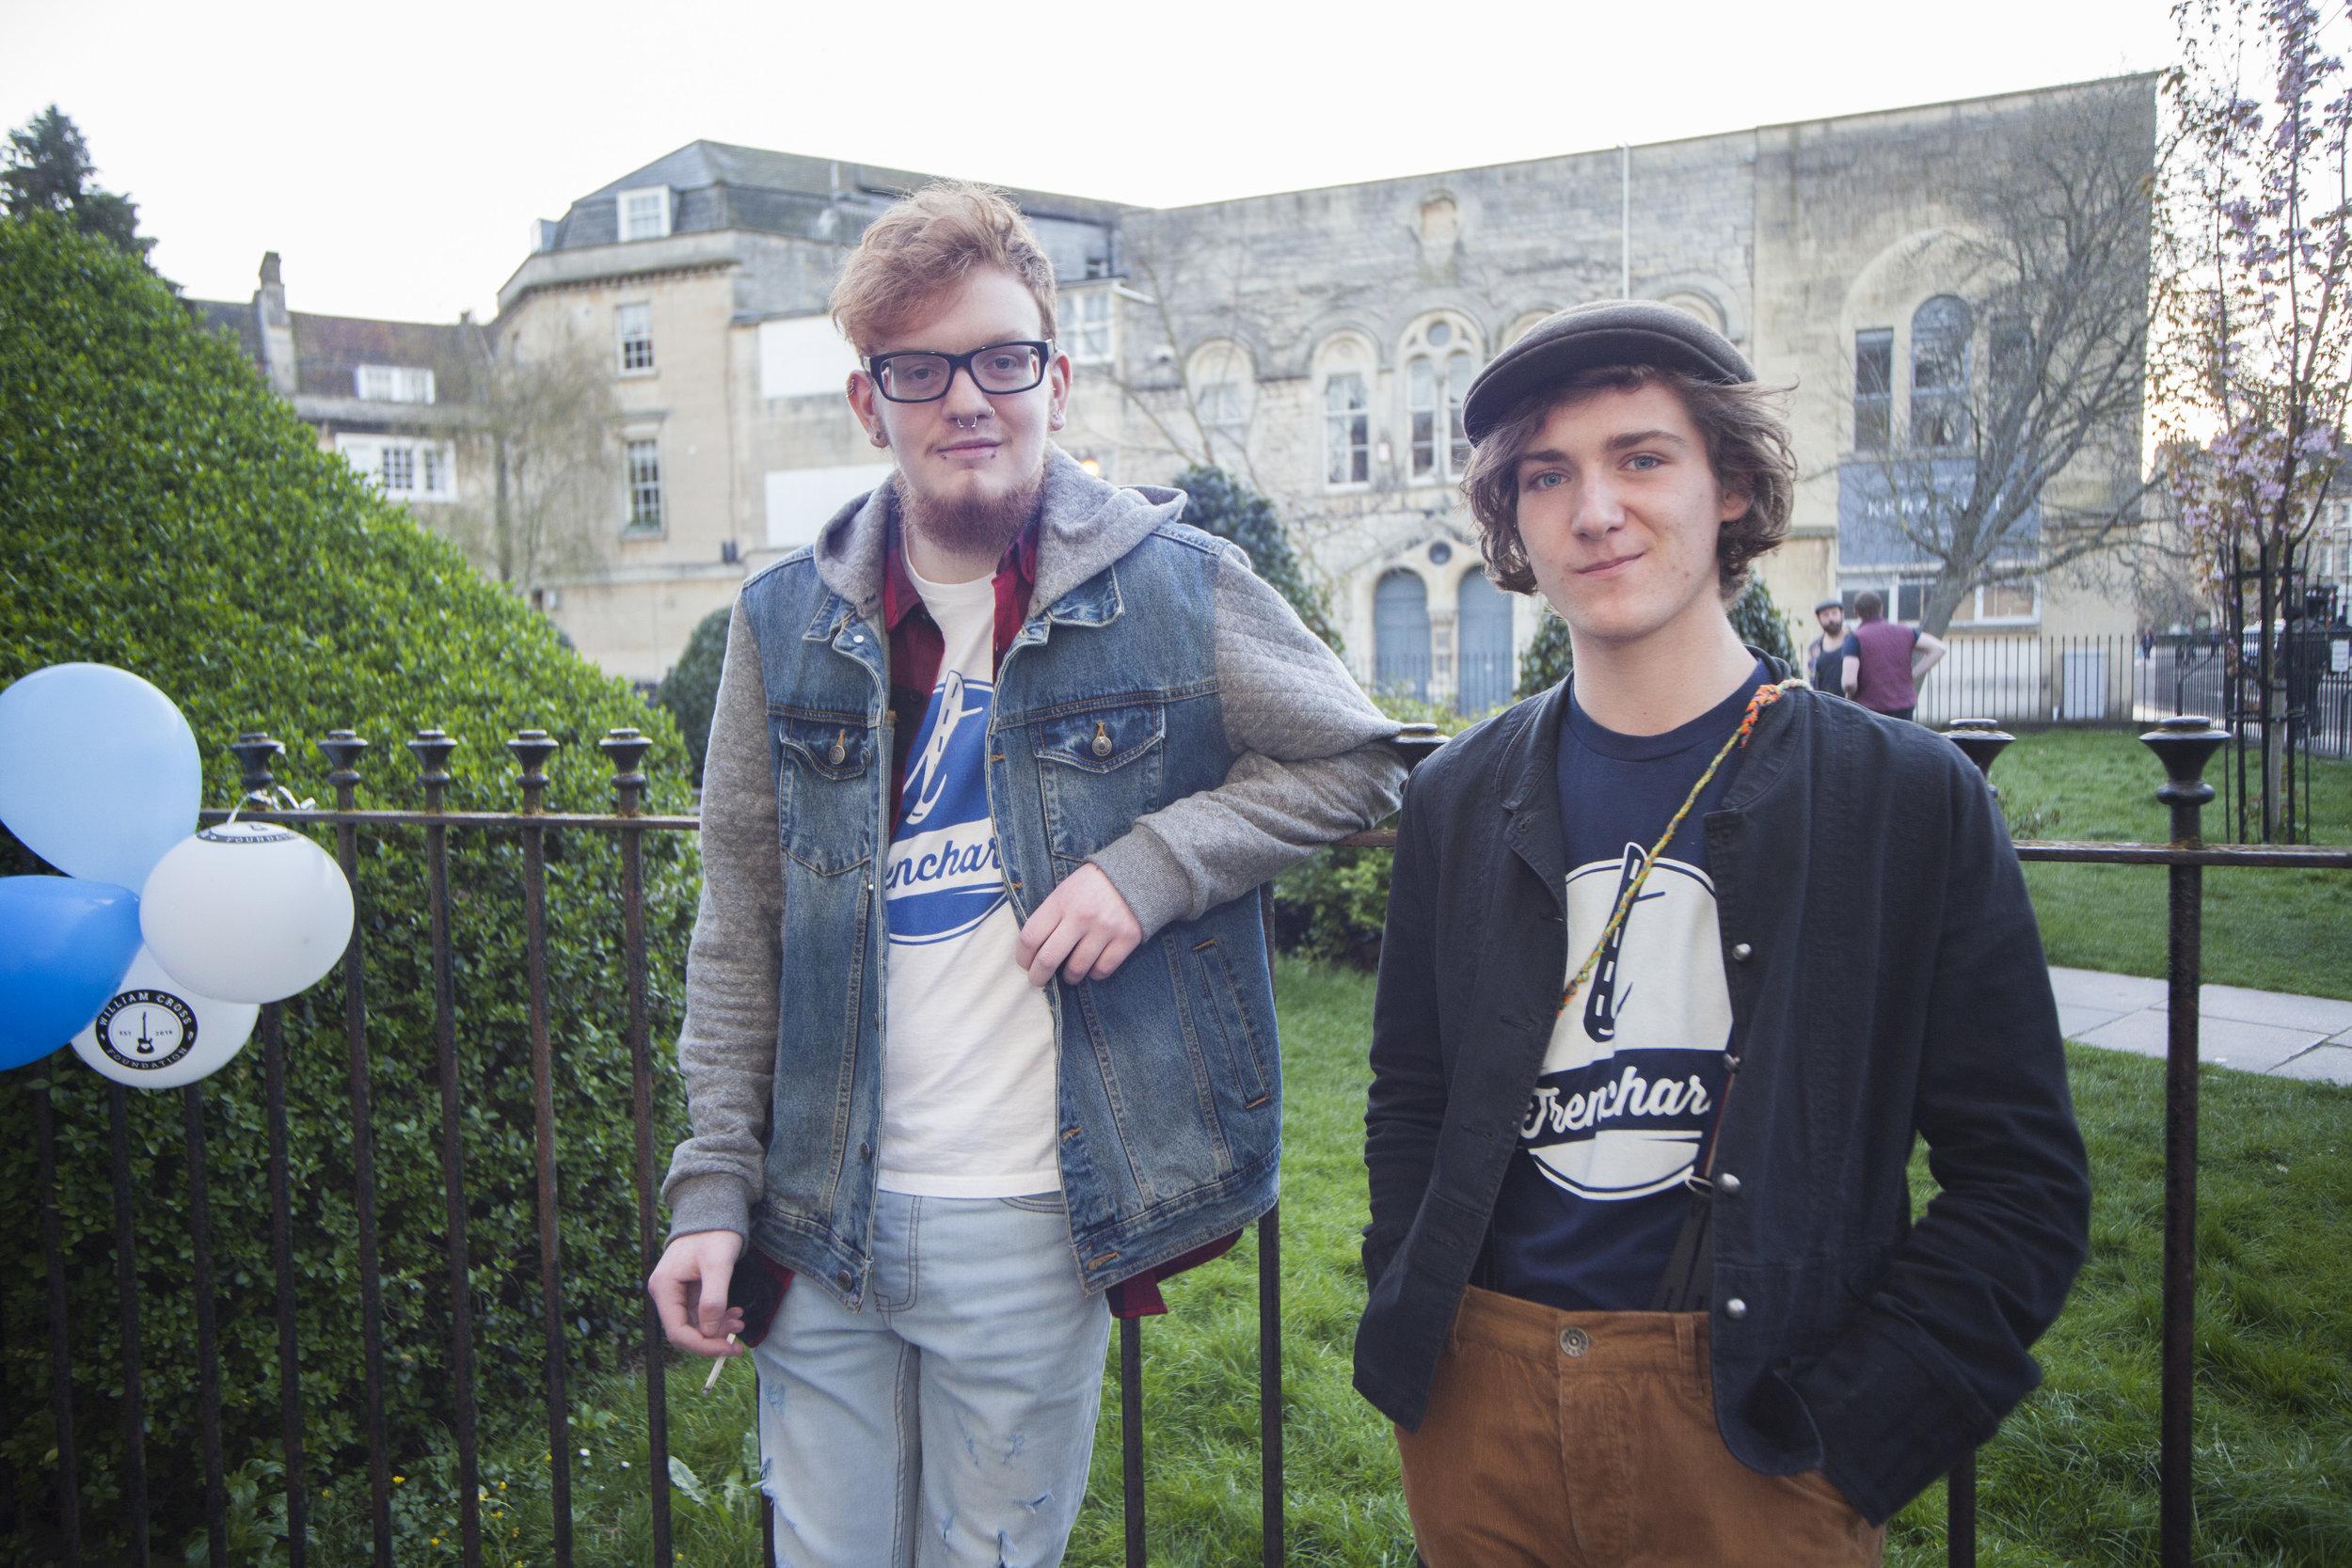 Chris Borgars and Cameron Thomas